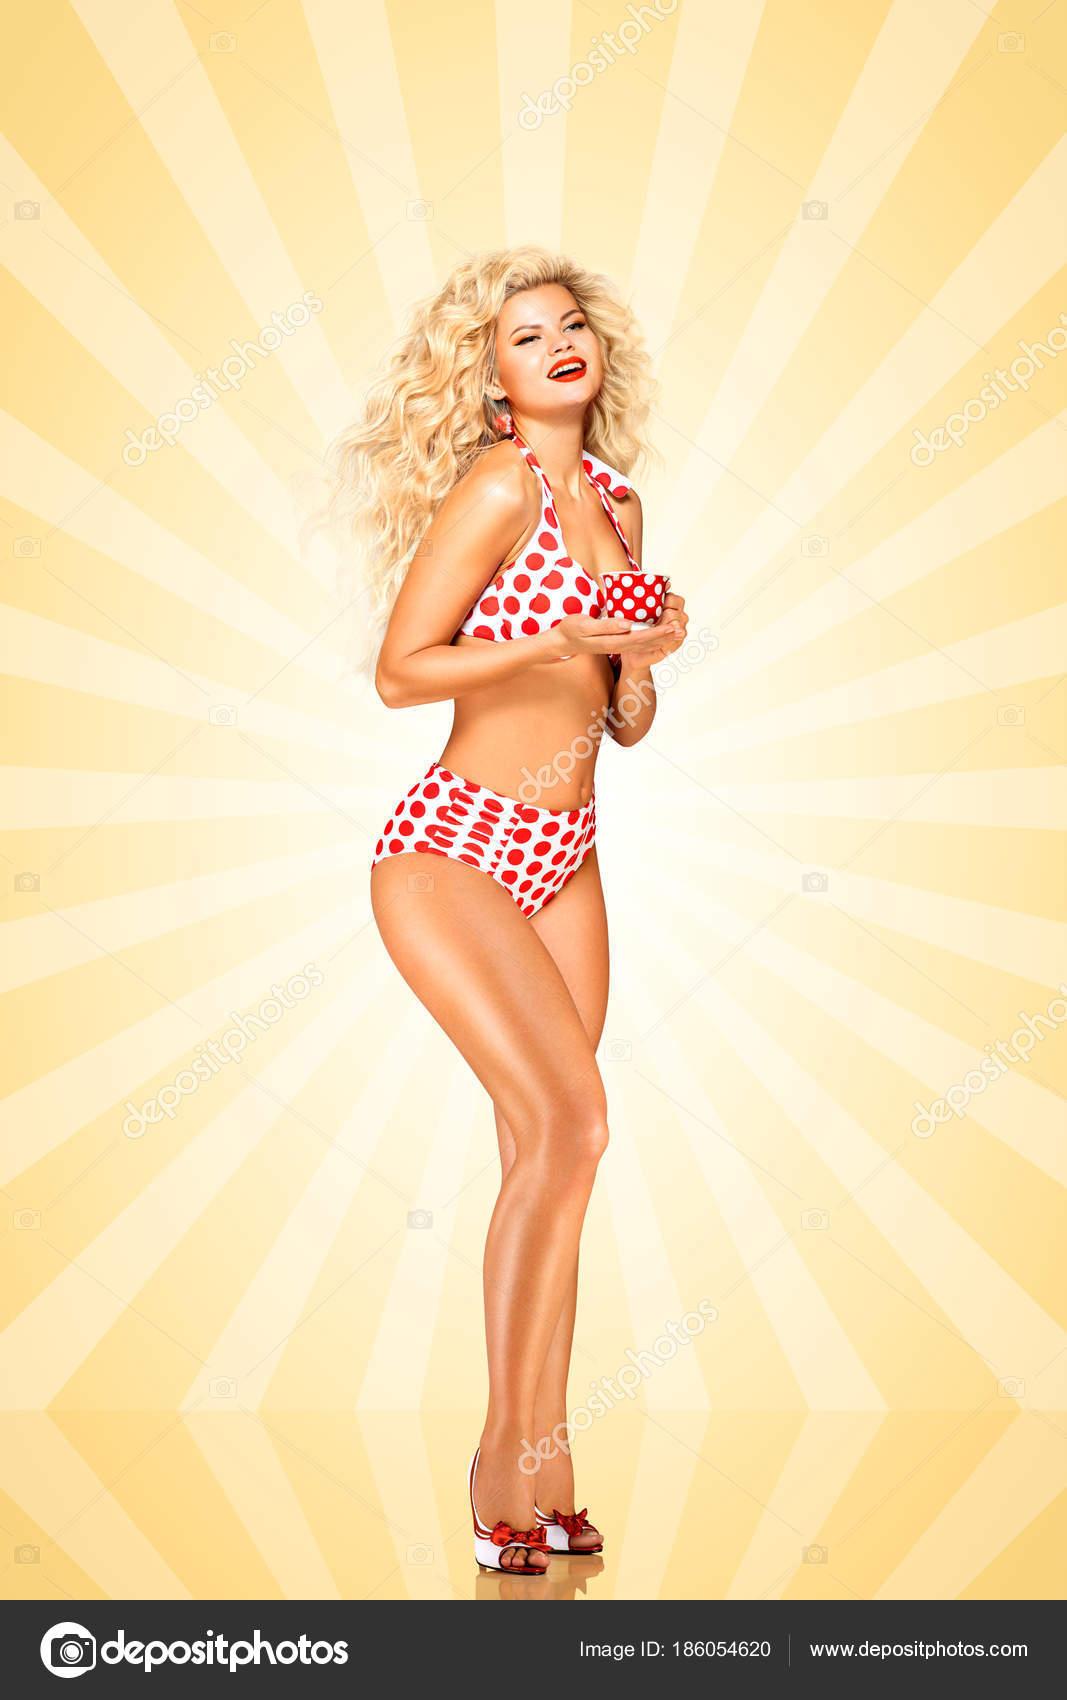 eef9b26c2b1e Modelo Hermoso Bikini Pinup Sostener Taza Café Sobre Fondo Estilo ...